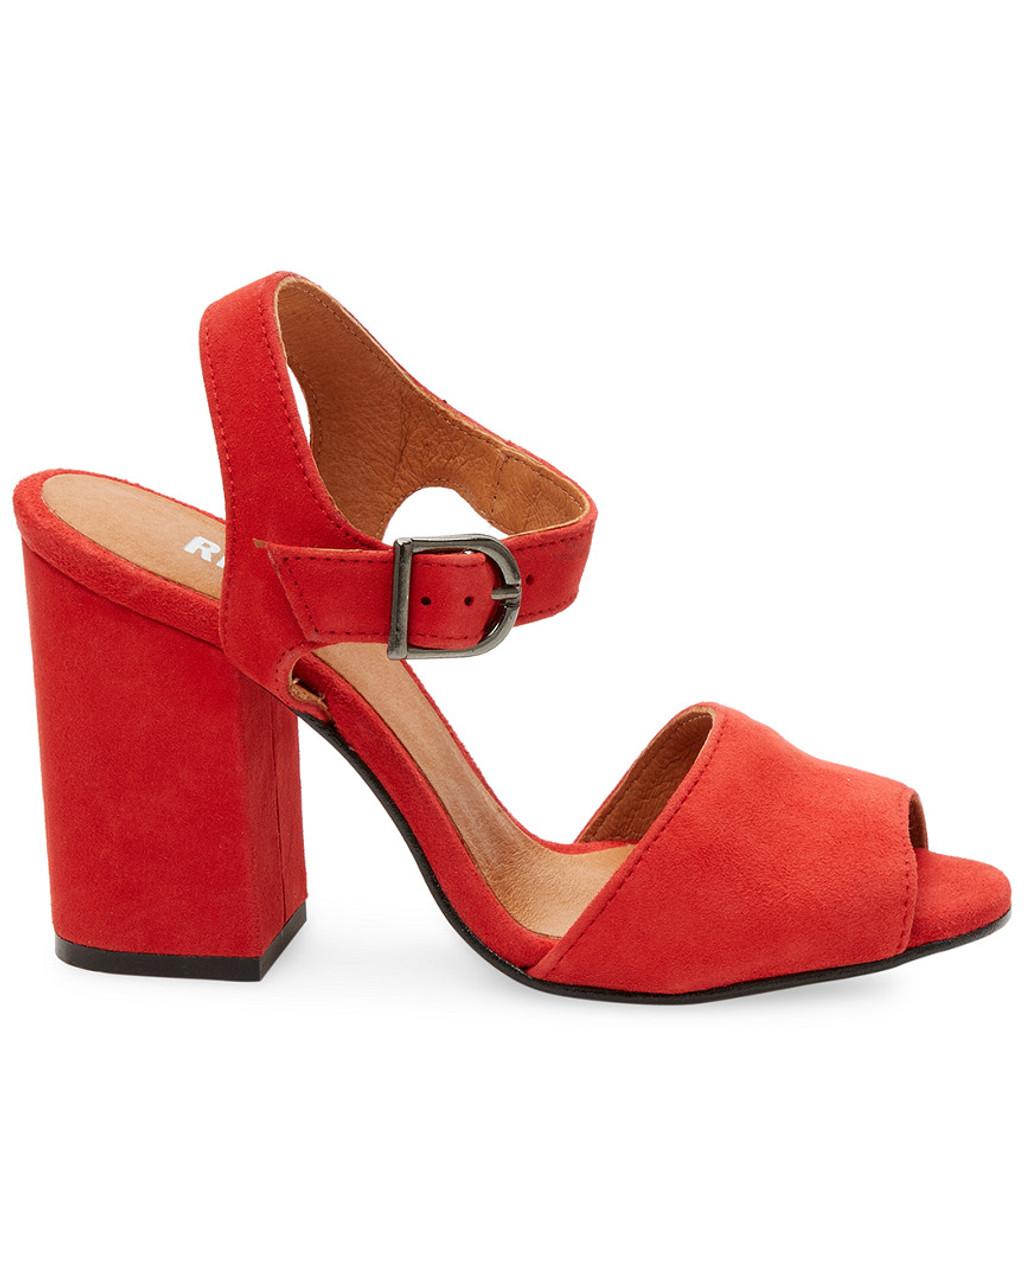 37b26e1f8b0 RENVY Brocade Block Heel Sandal~1311772241 - Boston Store